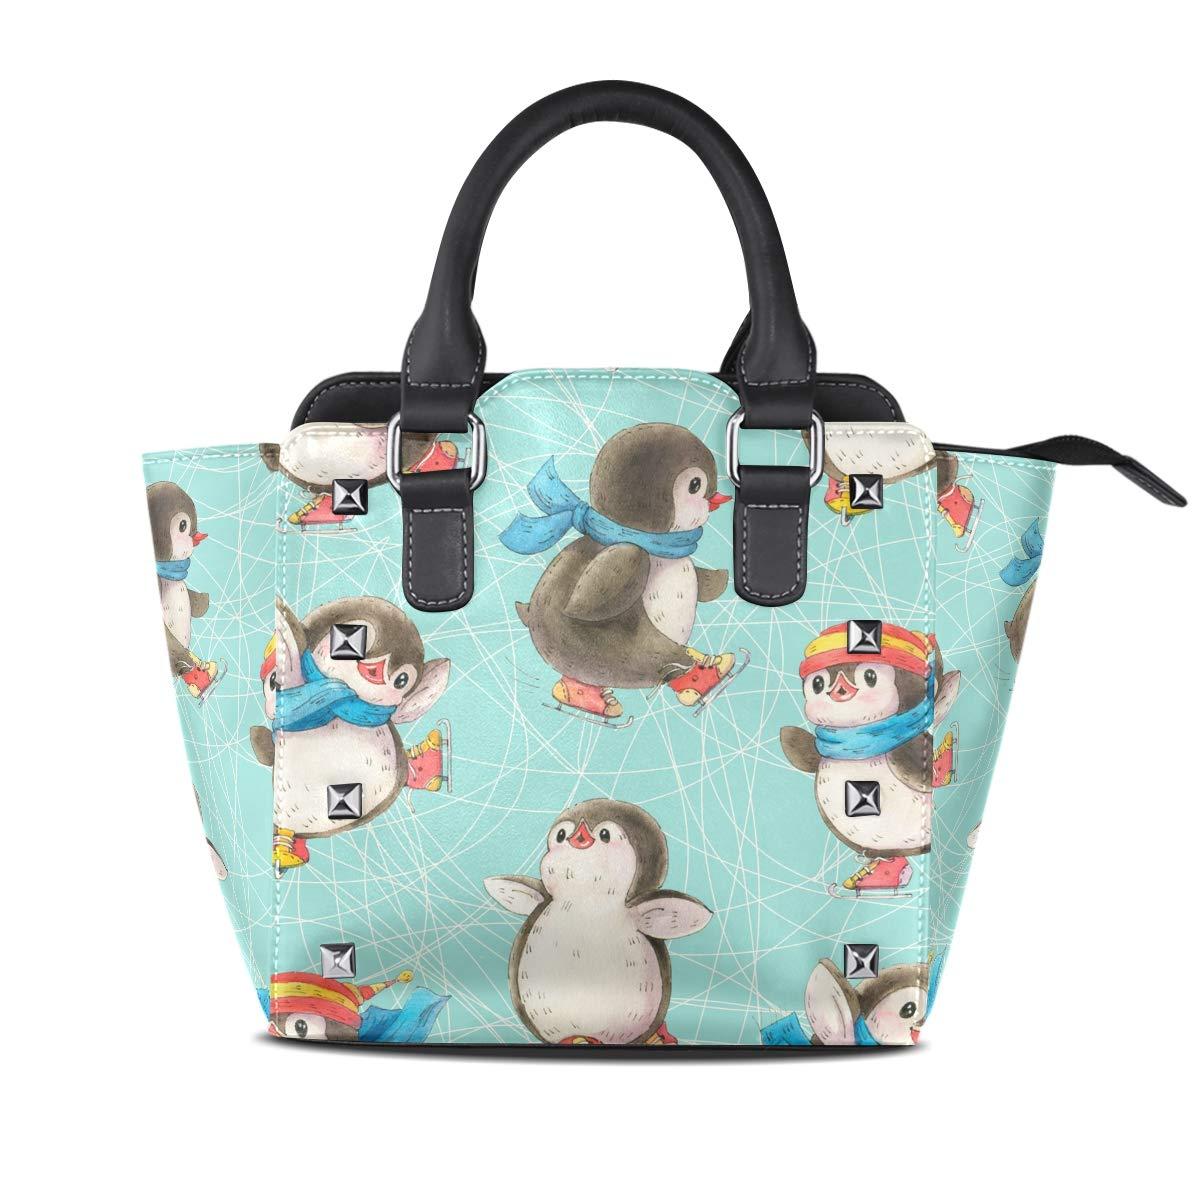 Design5 Handbag Tribal Style Elephant And Lotus Genuine Leather Tote Rivet Bag Shoulder Strap Top Handle Women